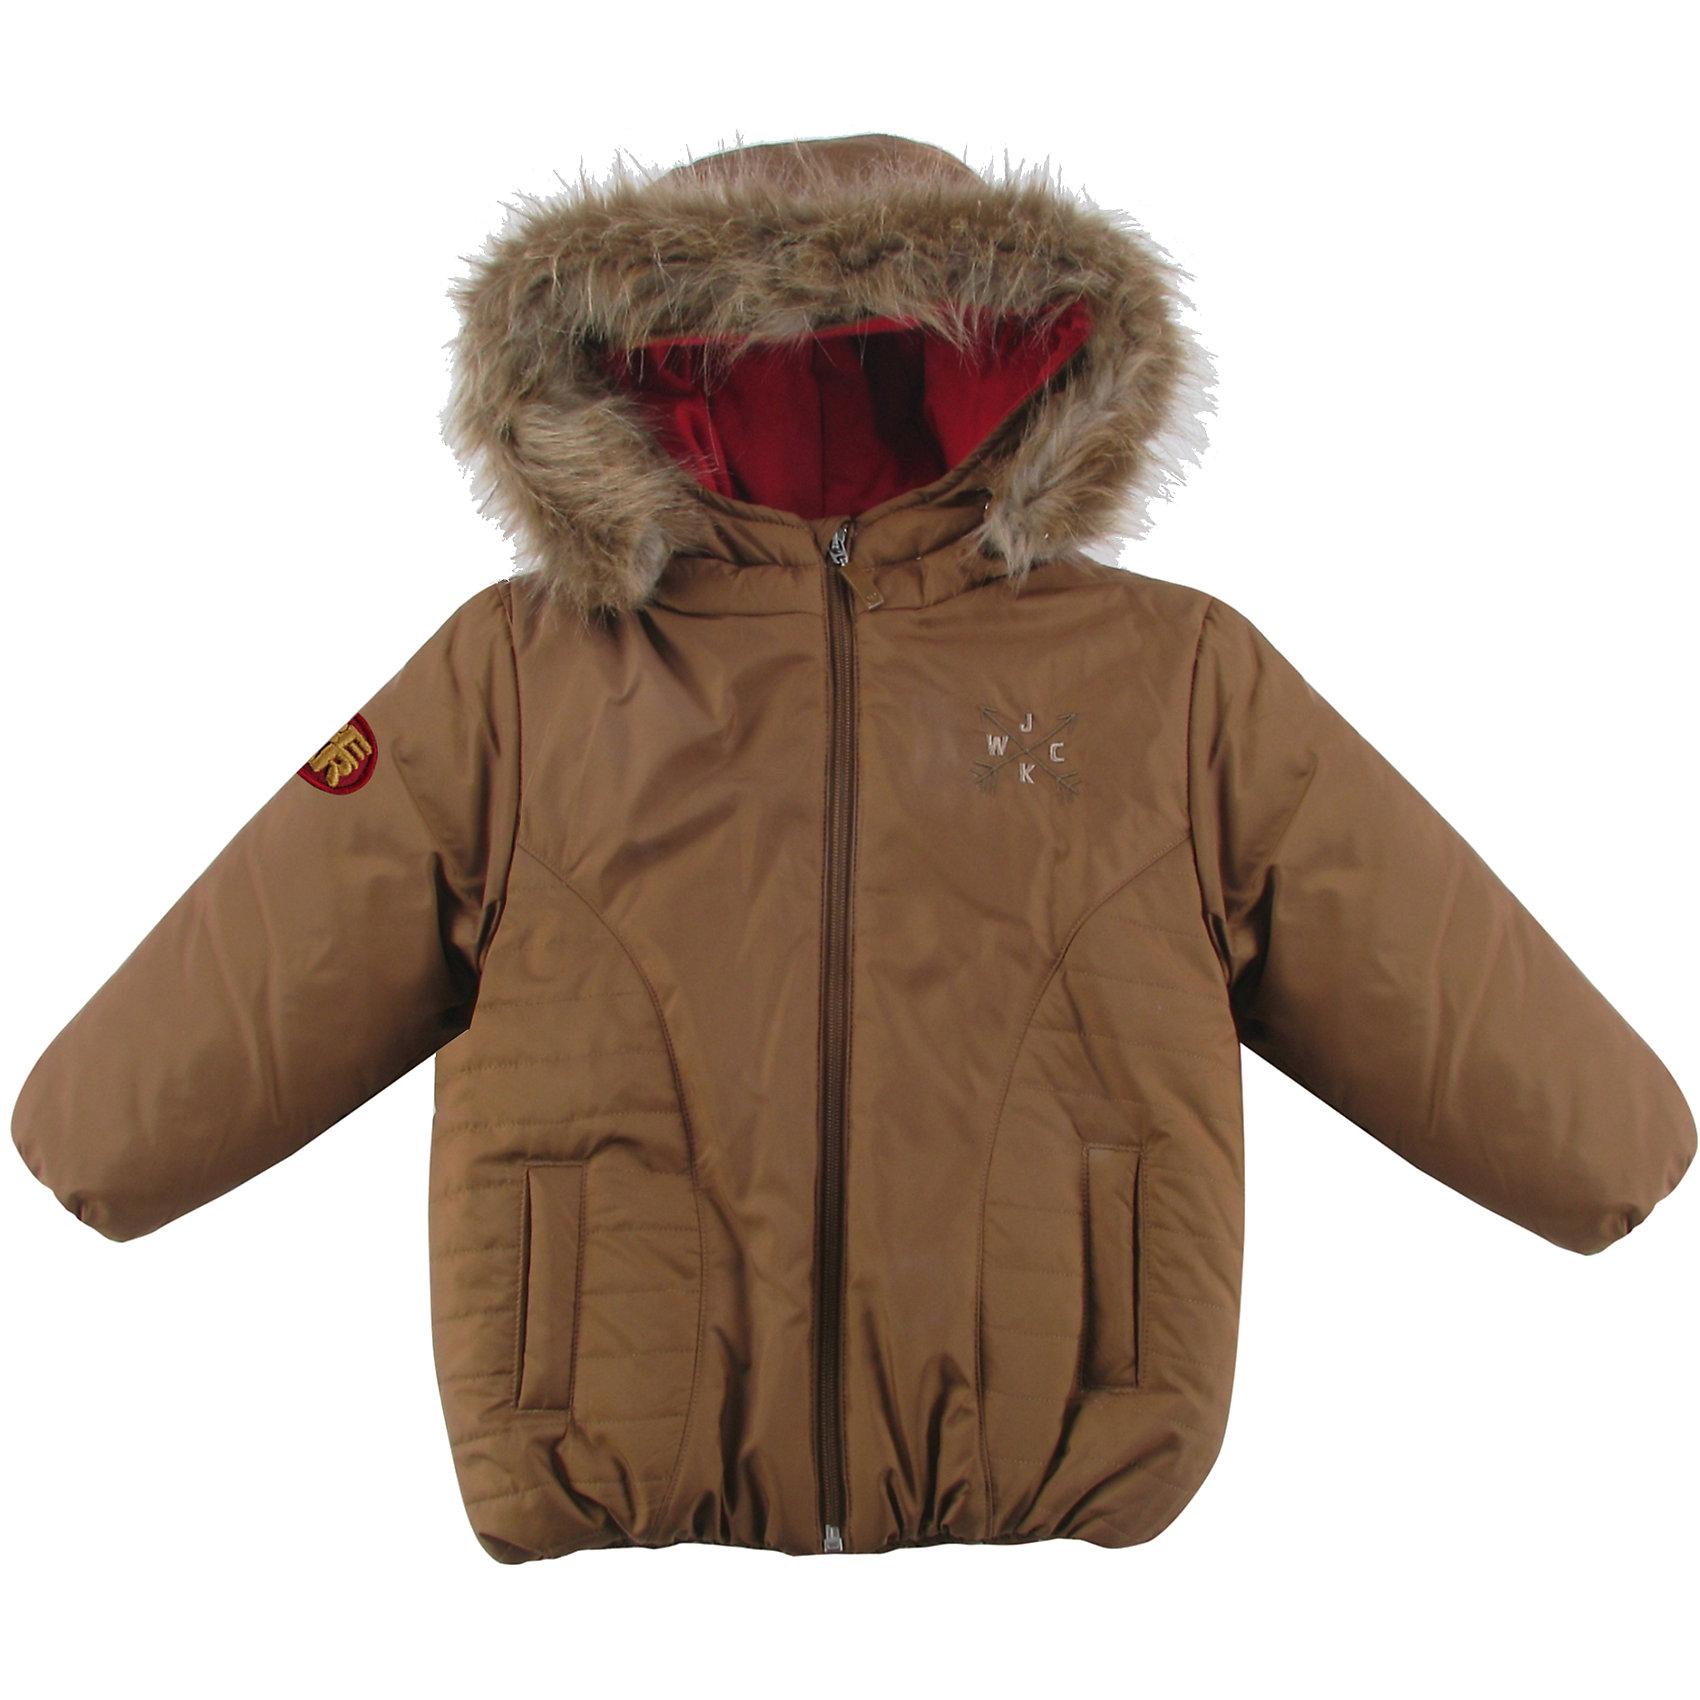 Куртка утепленная для мальчика WojcikВерхняя одежда<br>Куртка утепленная для мальчика Wojcik<br>Состав:<br>Полиэстер 100%<br><br>Ширина мм: 356<br>Глубина мм: 10<br>Высота мм: 245<br>Вес г: 519<br>Цвет: коричневый<br>Возраст от месяцев: 24<br>Возраст до месяцев: 36<br>Пол: Мужской<br>Возраст: Детский<br>Размер: 98,86,92<br>SKU: 5591977